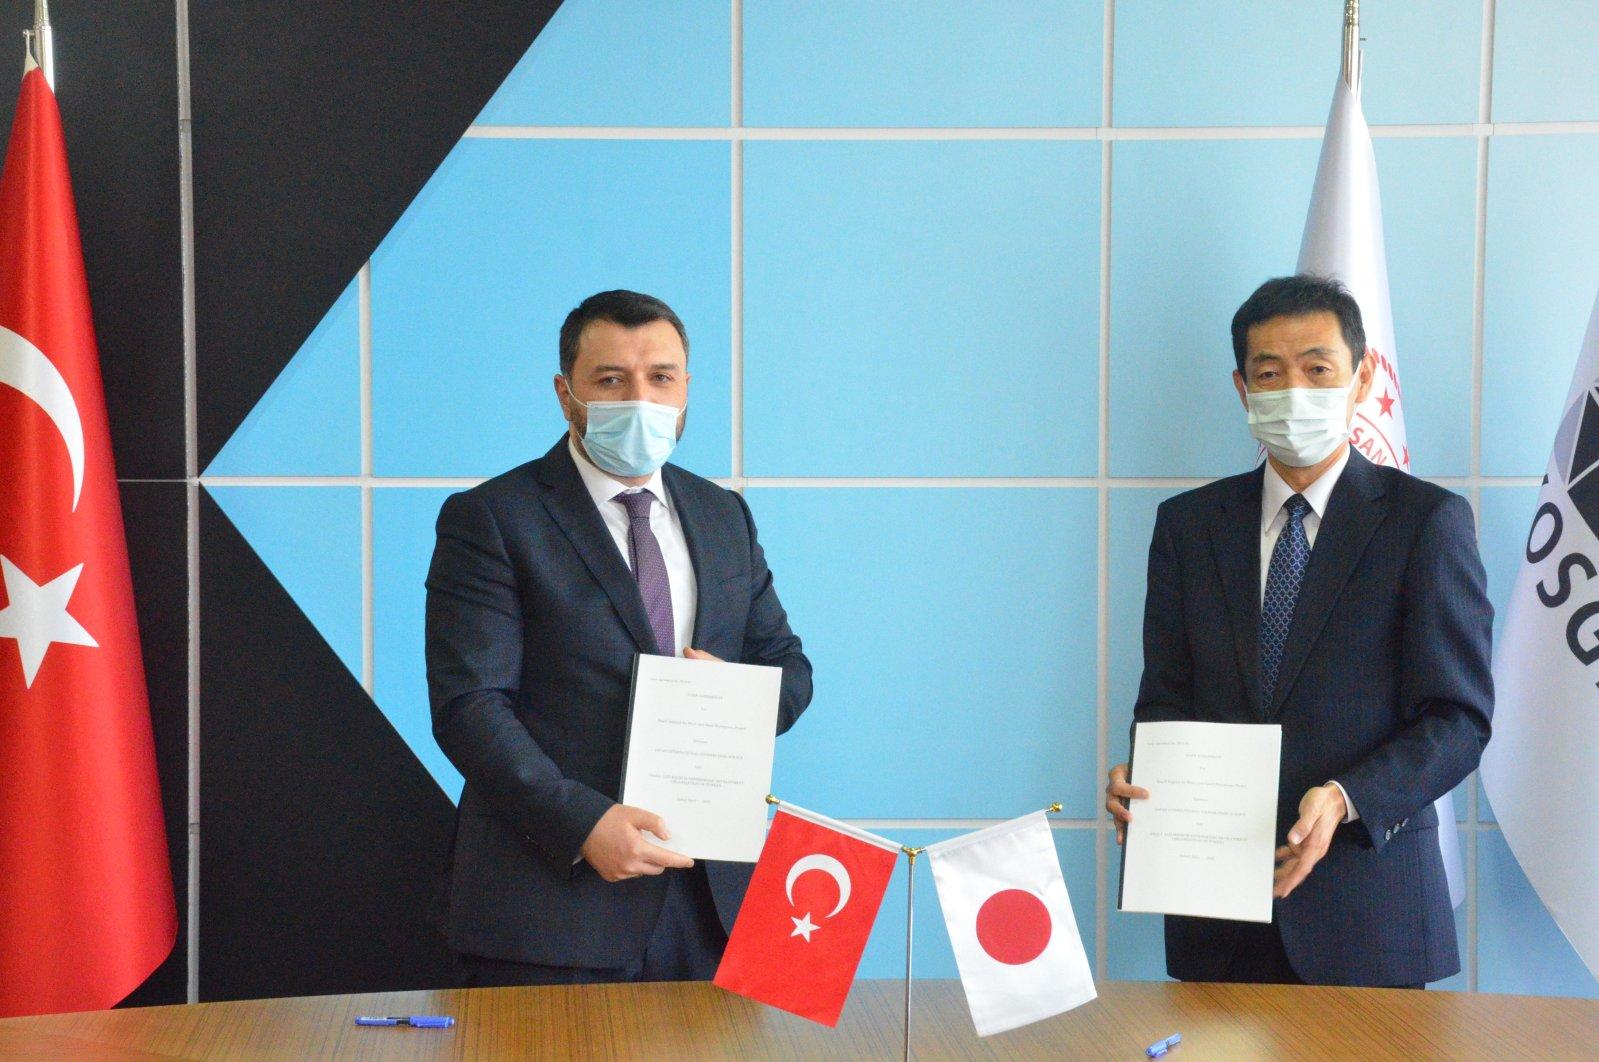 Small and Medium Industry Development Organization (KOSGEB) head Hasan Basri Kurt (L) and Japan International Cooperation Agency (JICA) Turkey head Nobuhiro Ikuro during a signing ceremony, Istanbul, Turkey, April, 21, 2021. (IHA Photo)